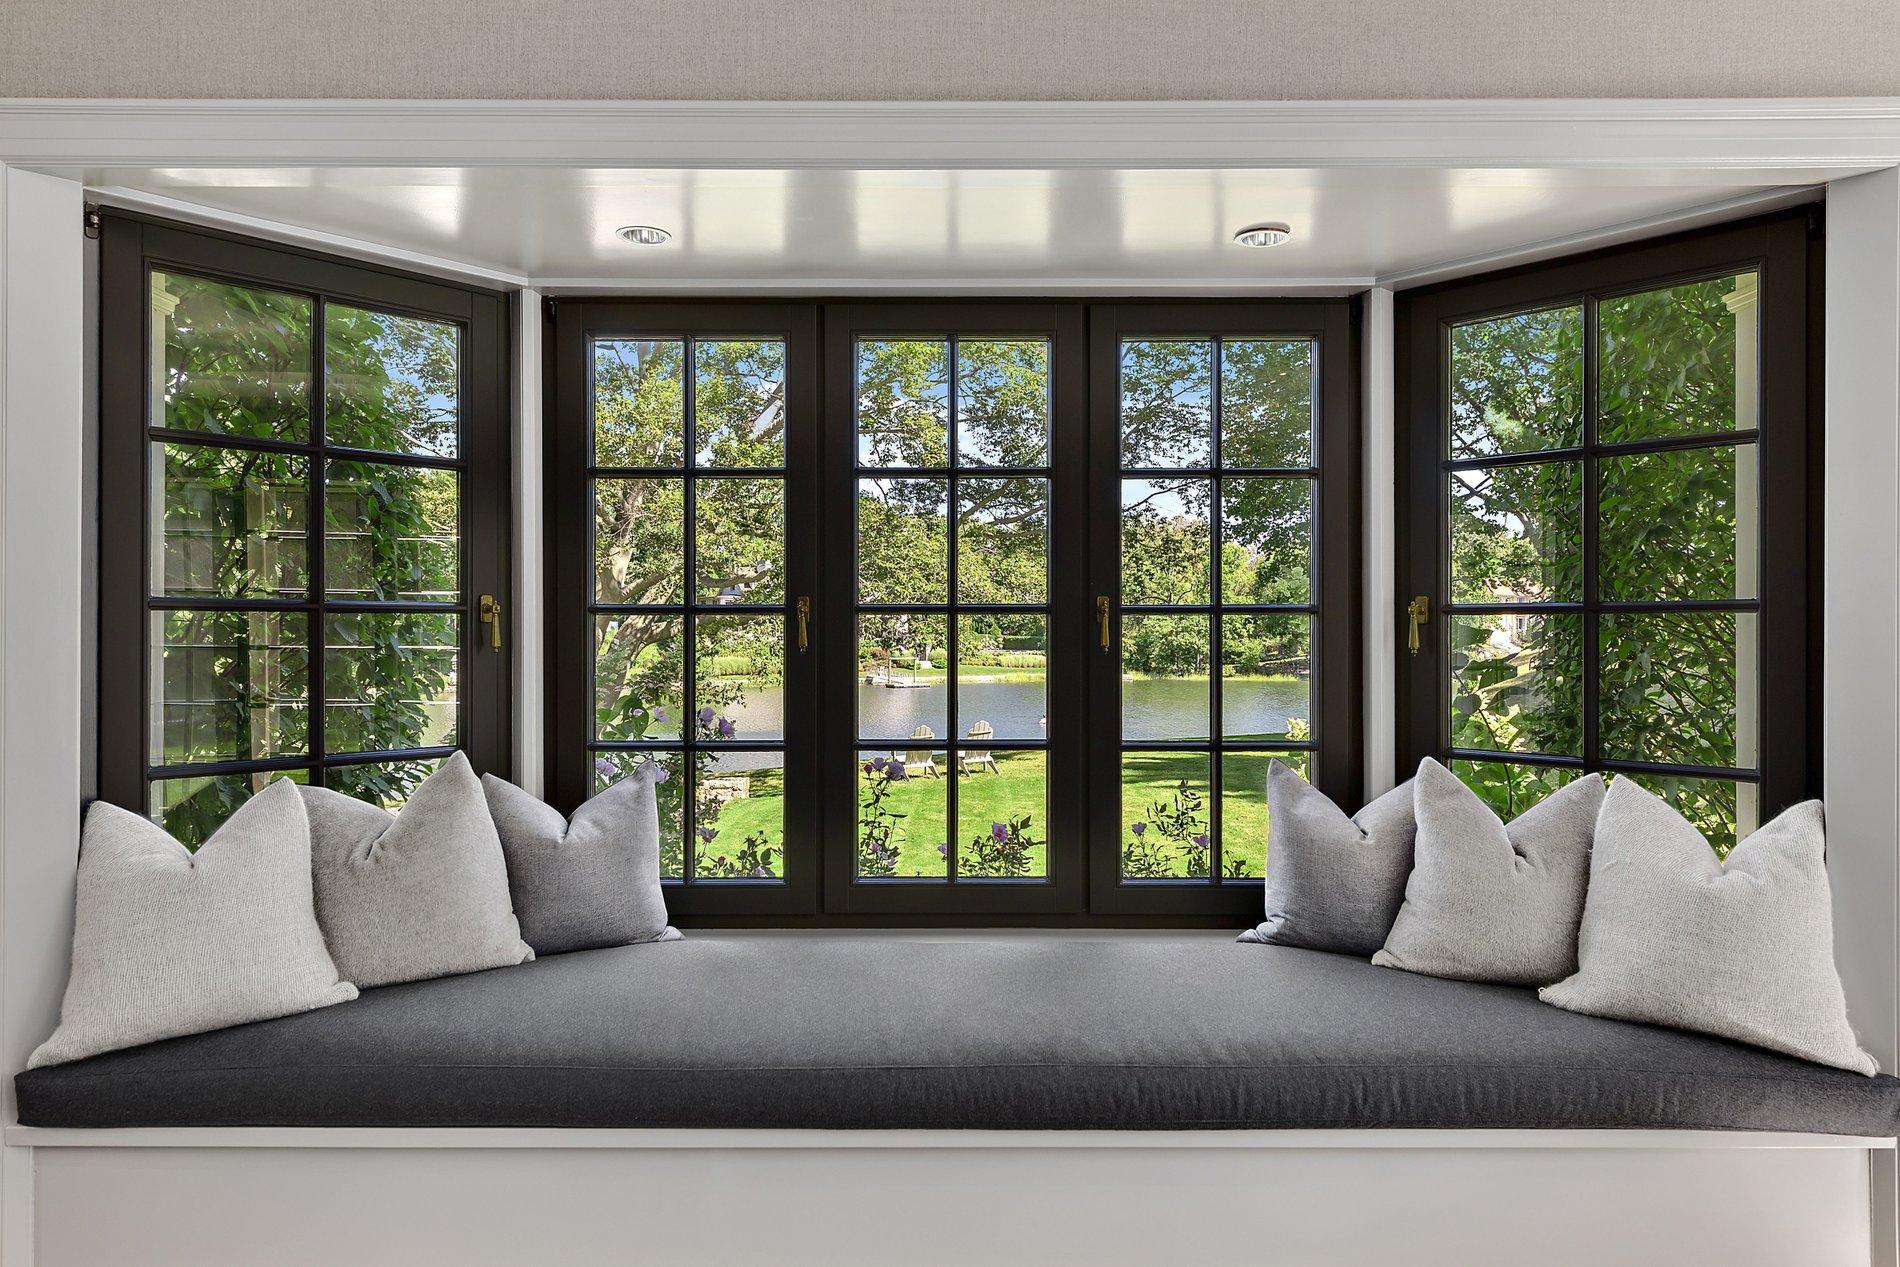 Modern bay window seat featuring a dark grey cushion, light grey pillows and black frame windows.